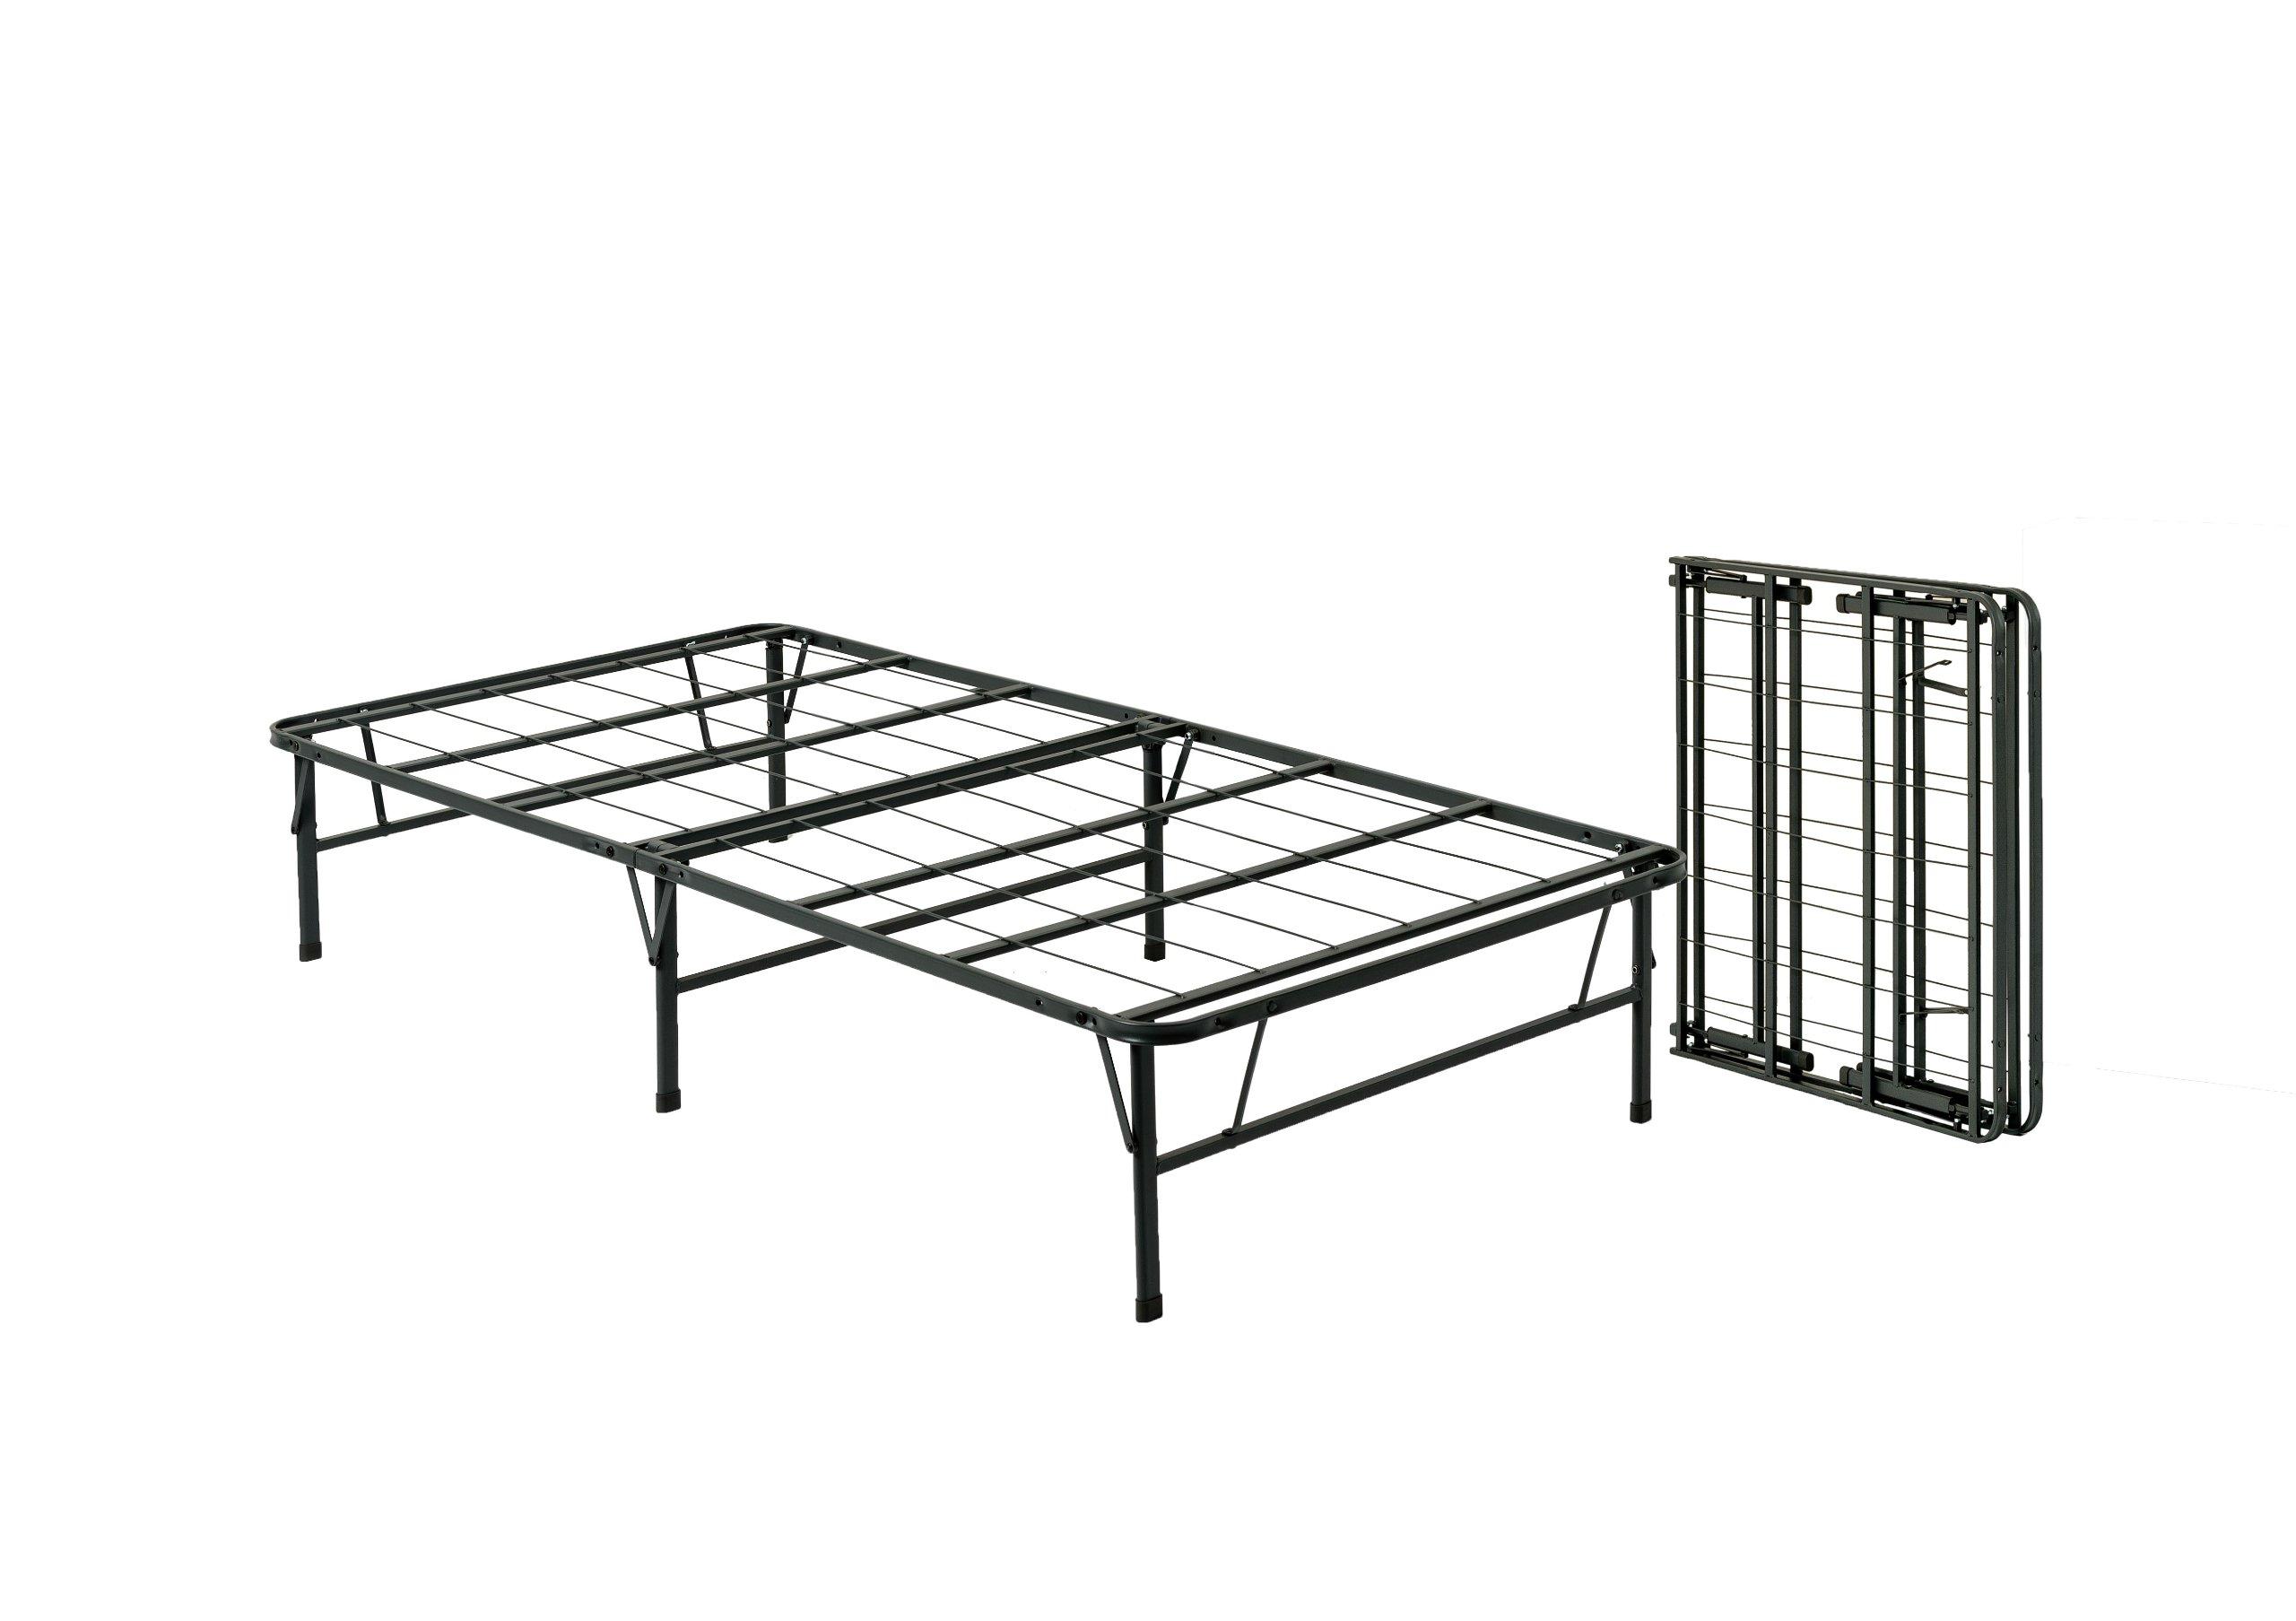 Pragma bed simple base bi fold bed frame twin twin ebay for Simple twin bed frame